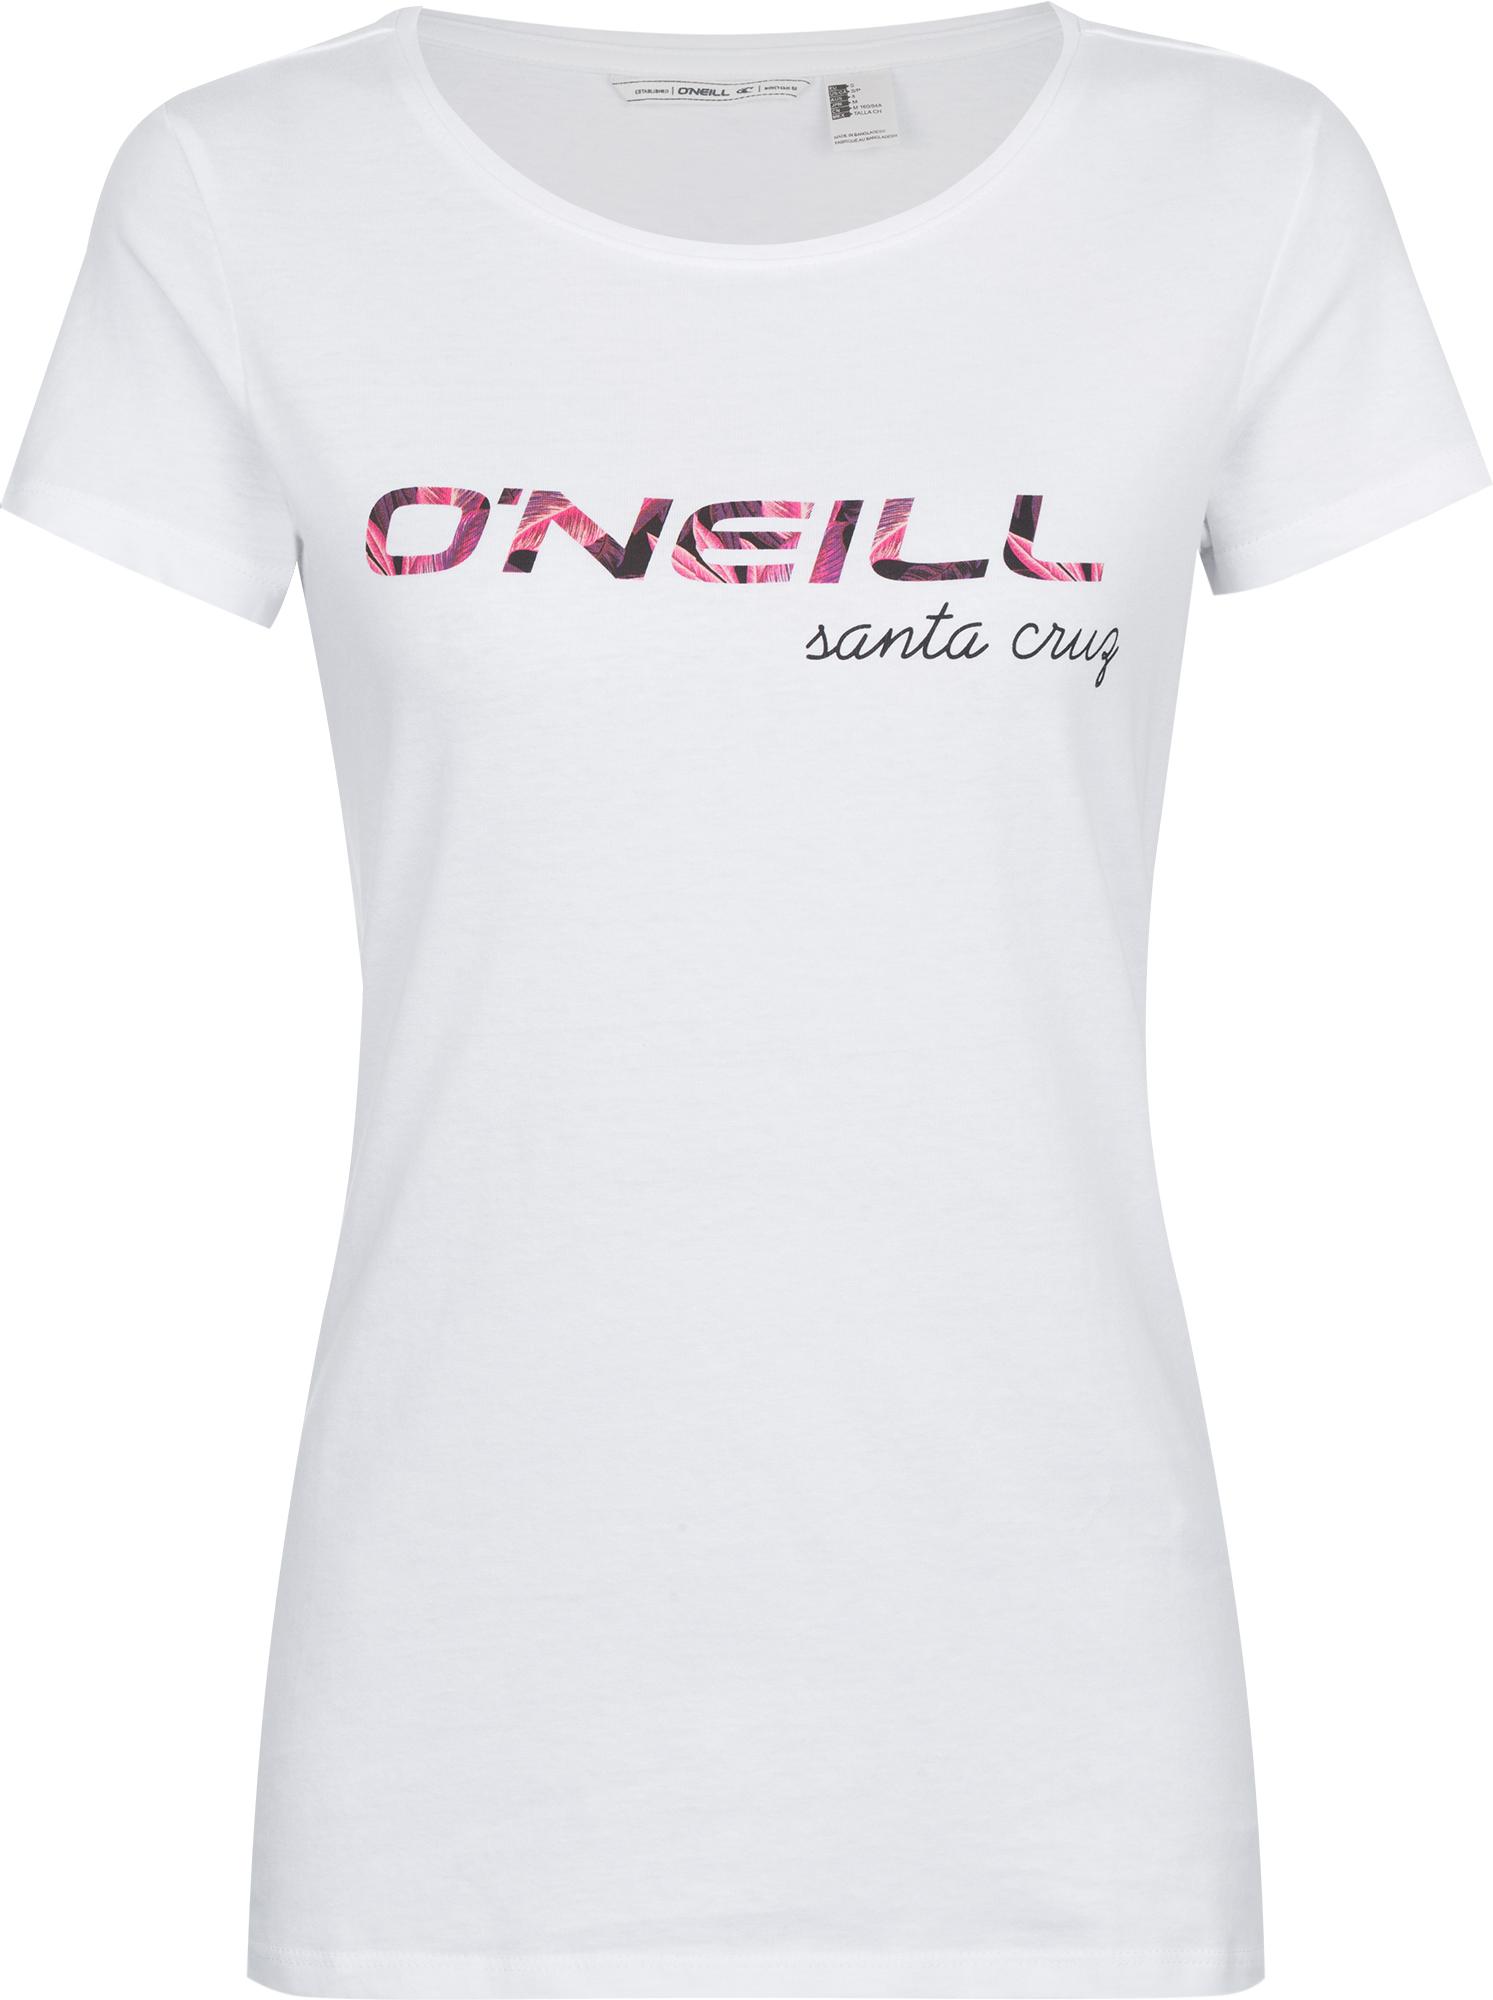 O'Neill Футболка женская O'Neill Sunshine Graphic, размер 44-46